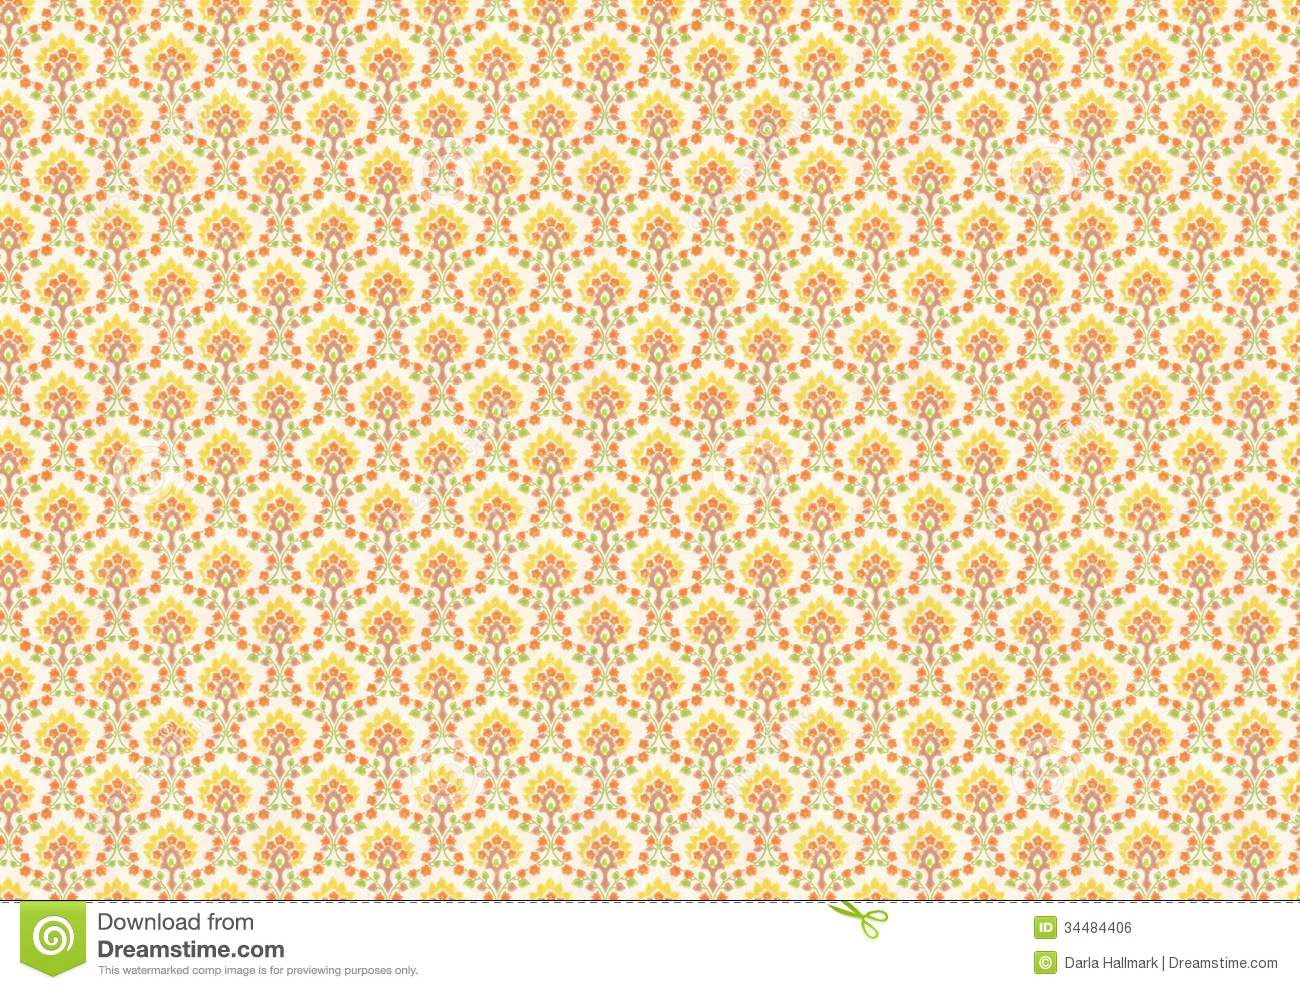 80s Wallpaper Patterns Seventies wallpaper royalty 1300x990